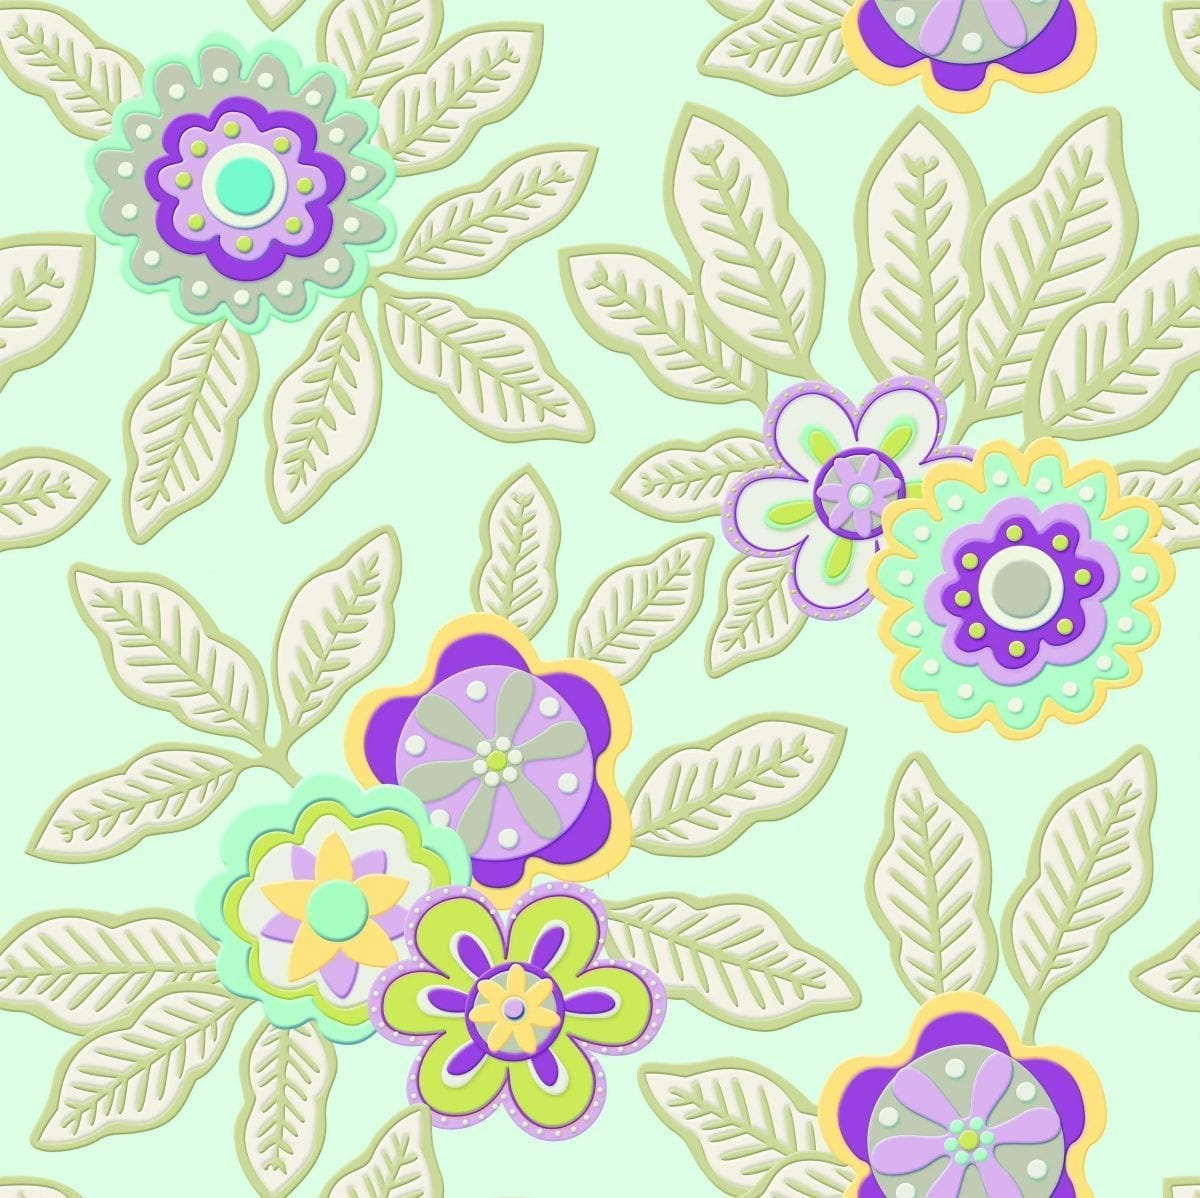 Papel mural Flores 3479-2 Muresco